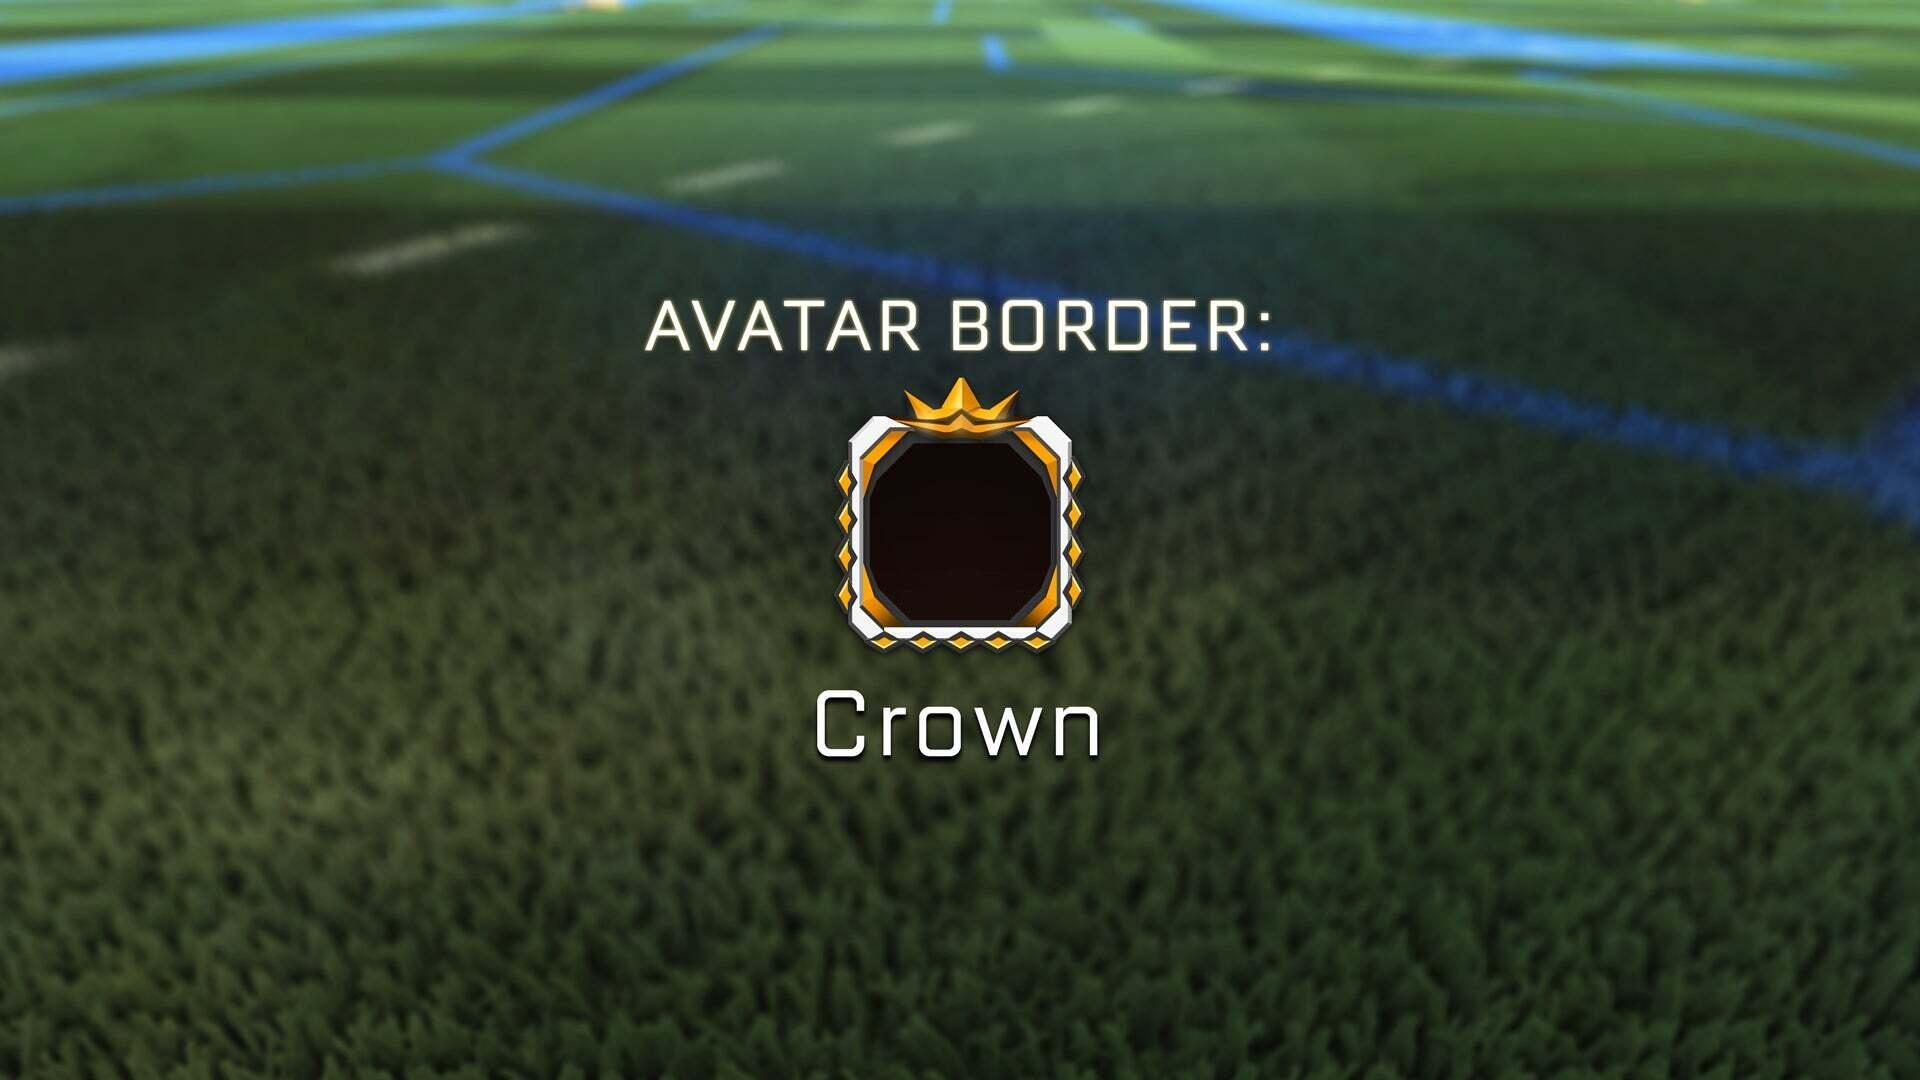 Crown Avatar Border